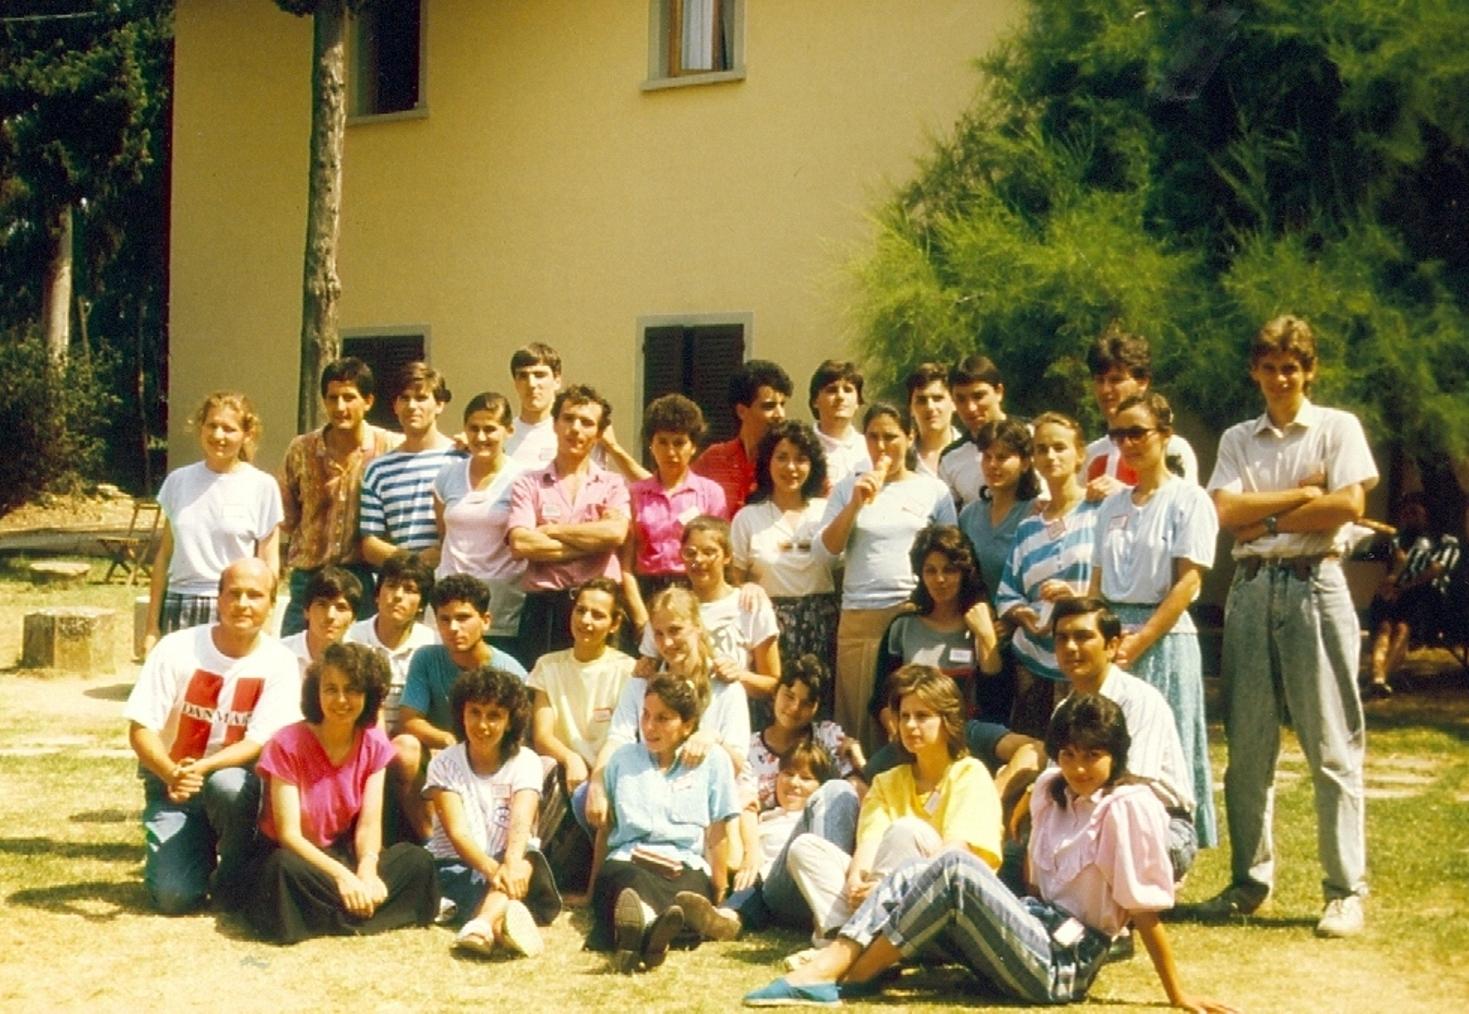 TINERI CREDINCIOSI DIN VECHEA BISERICA CRESTINA DUPA EVANGHELIE DRAGOS VODA IN VIZITA LA CENTRUL EVANGHELIC POGGIO UBERTINI DIN ITALIA 1990